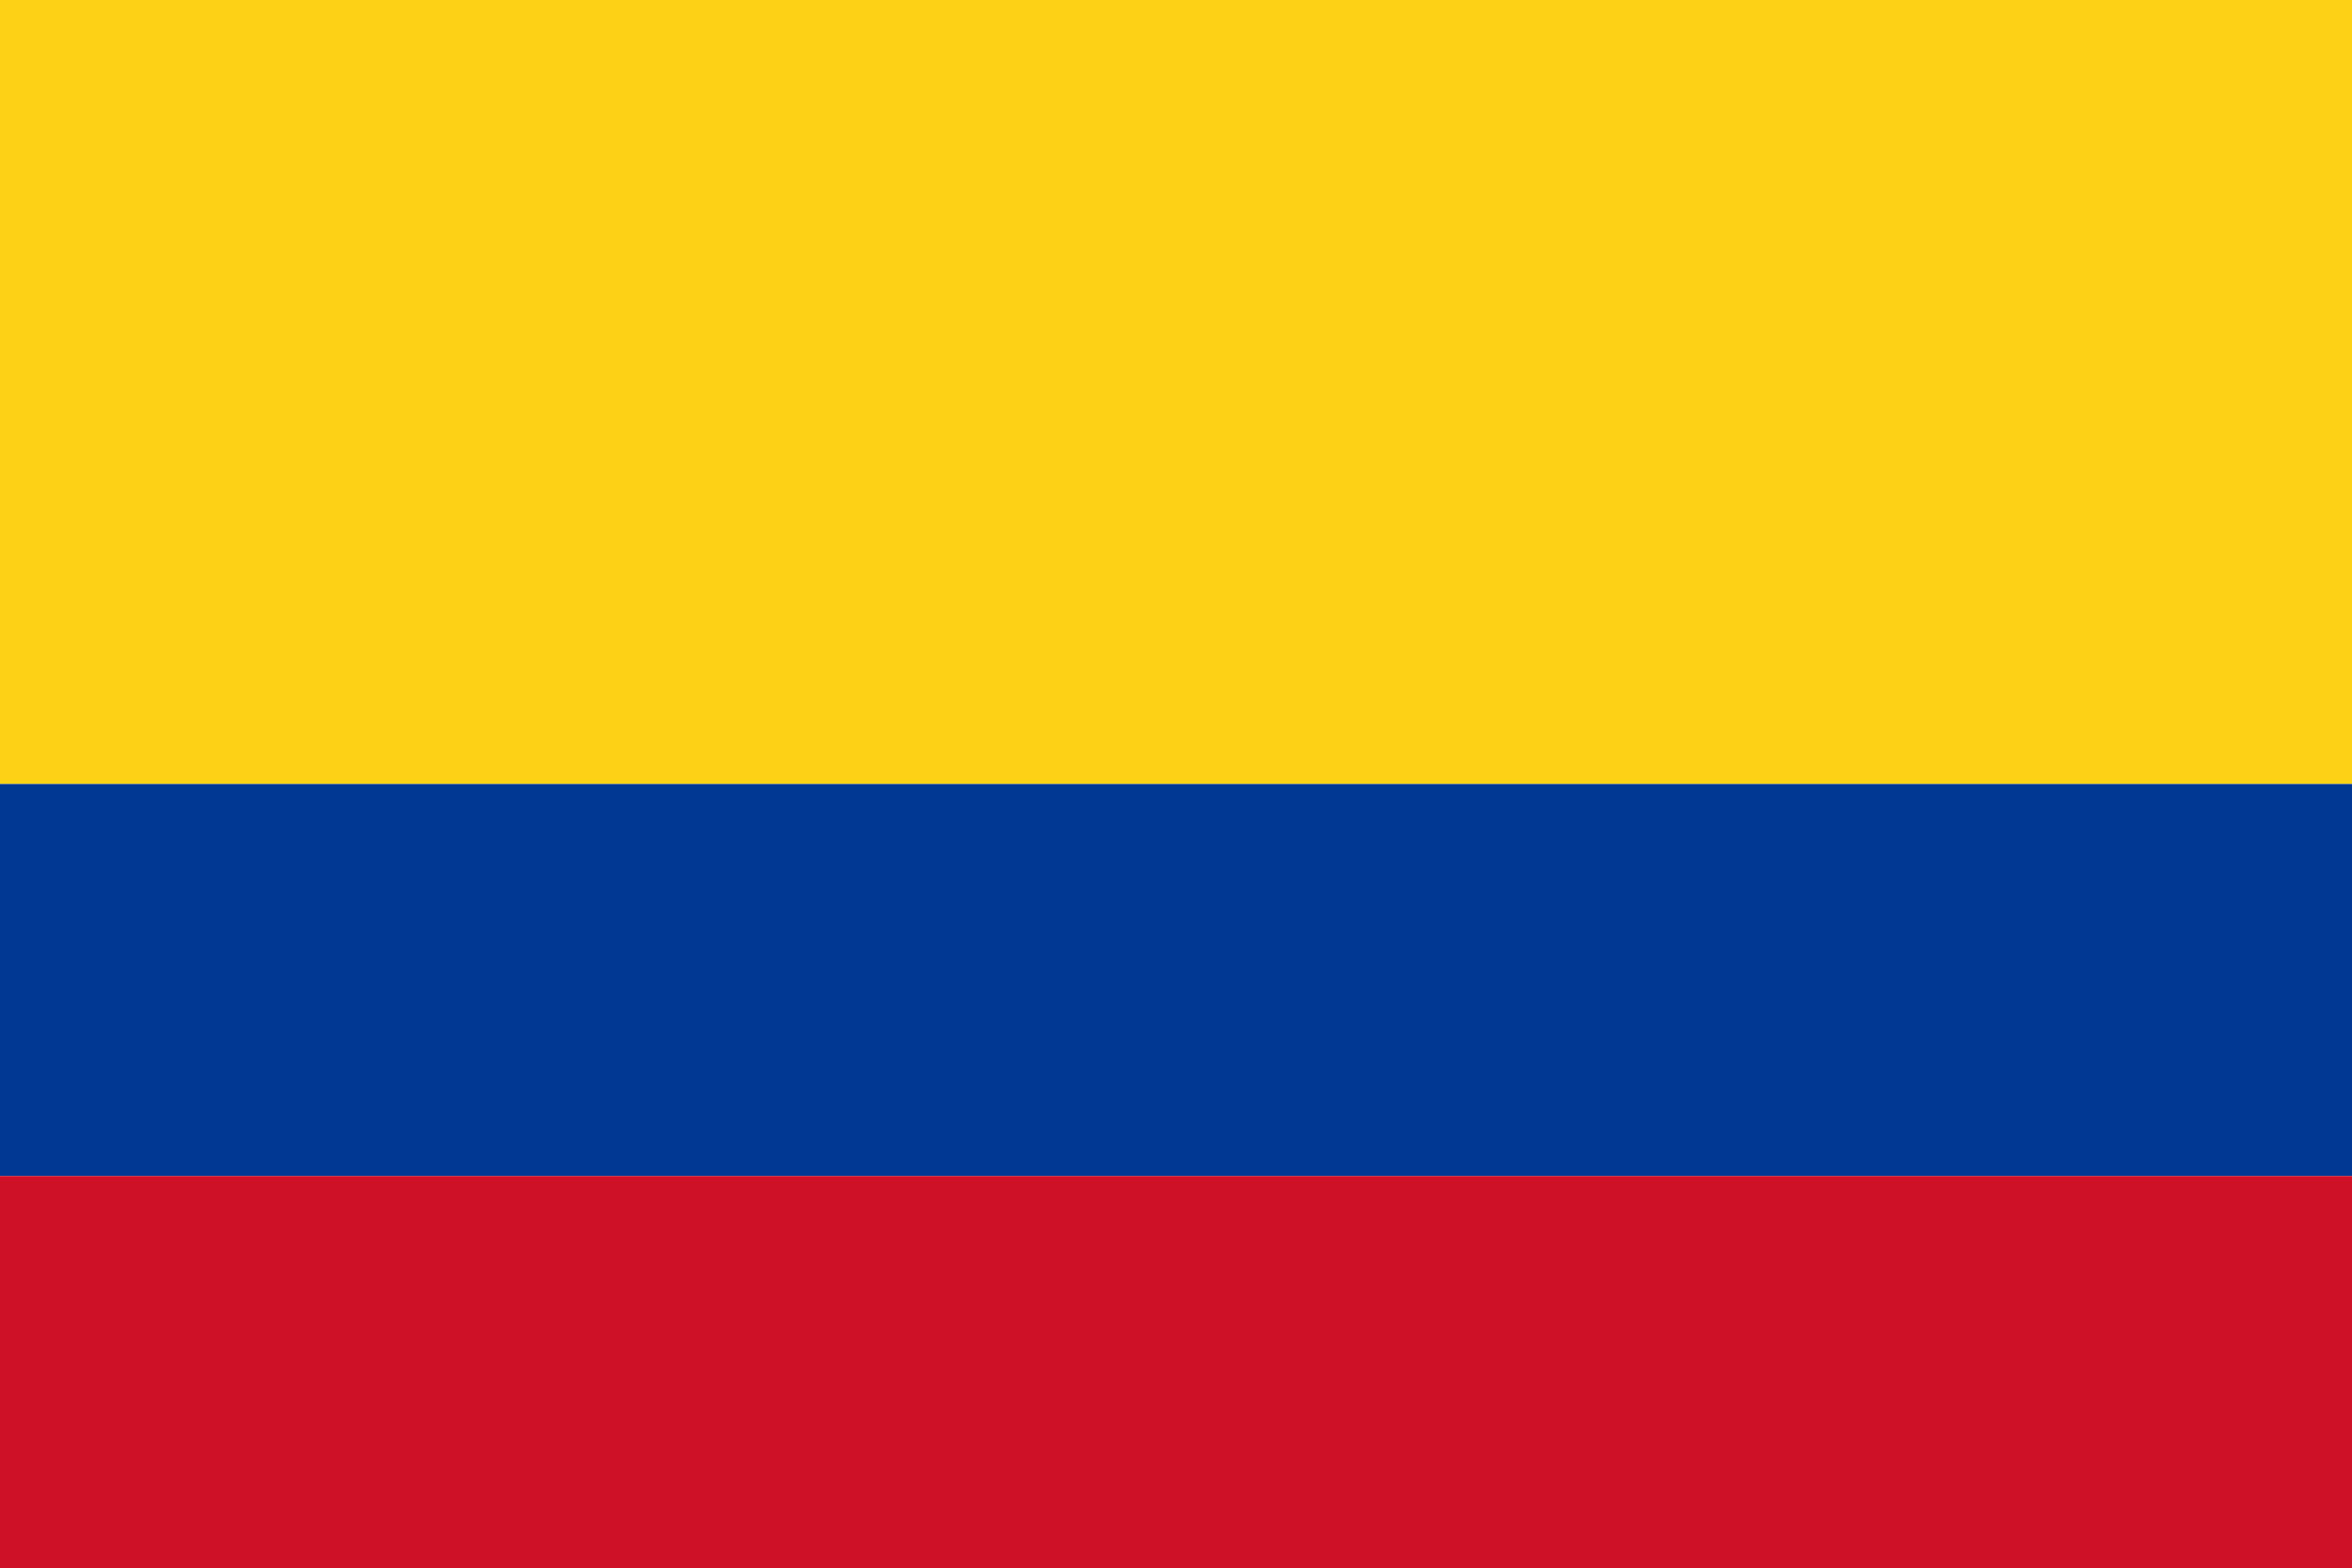 colombia, χώρα, έμβλημα, λογότυπο, σύμβολο - Wallpapers HD - Professor-falken.com